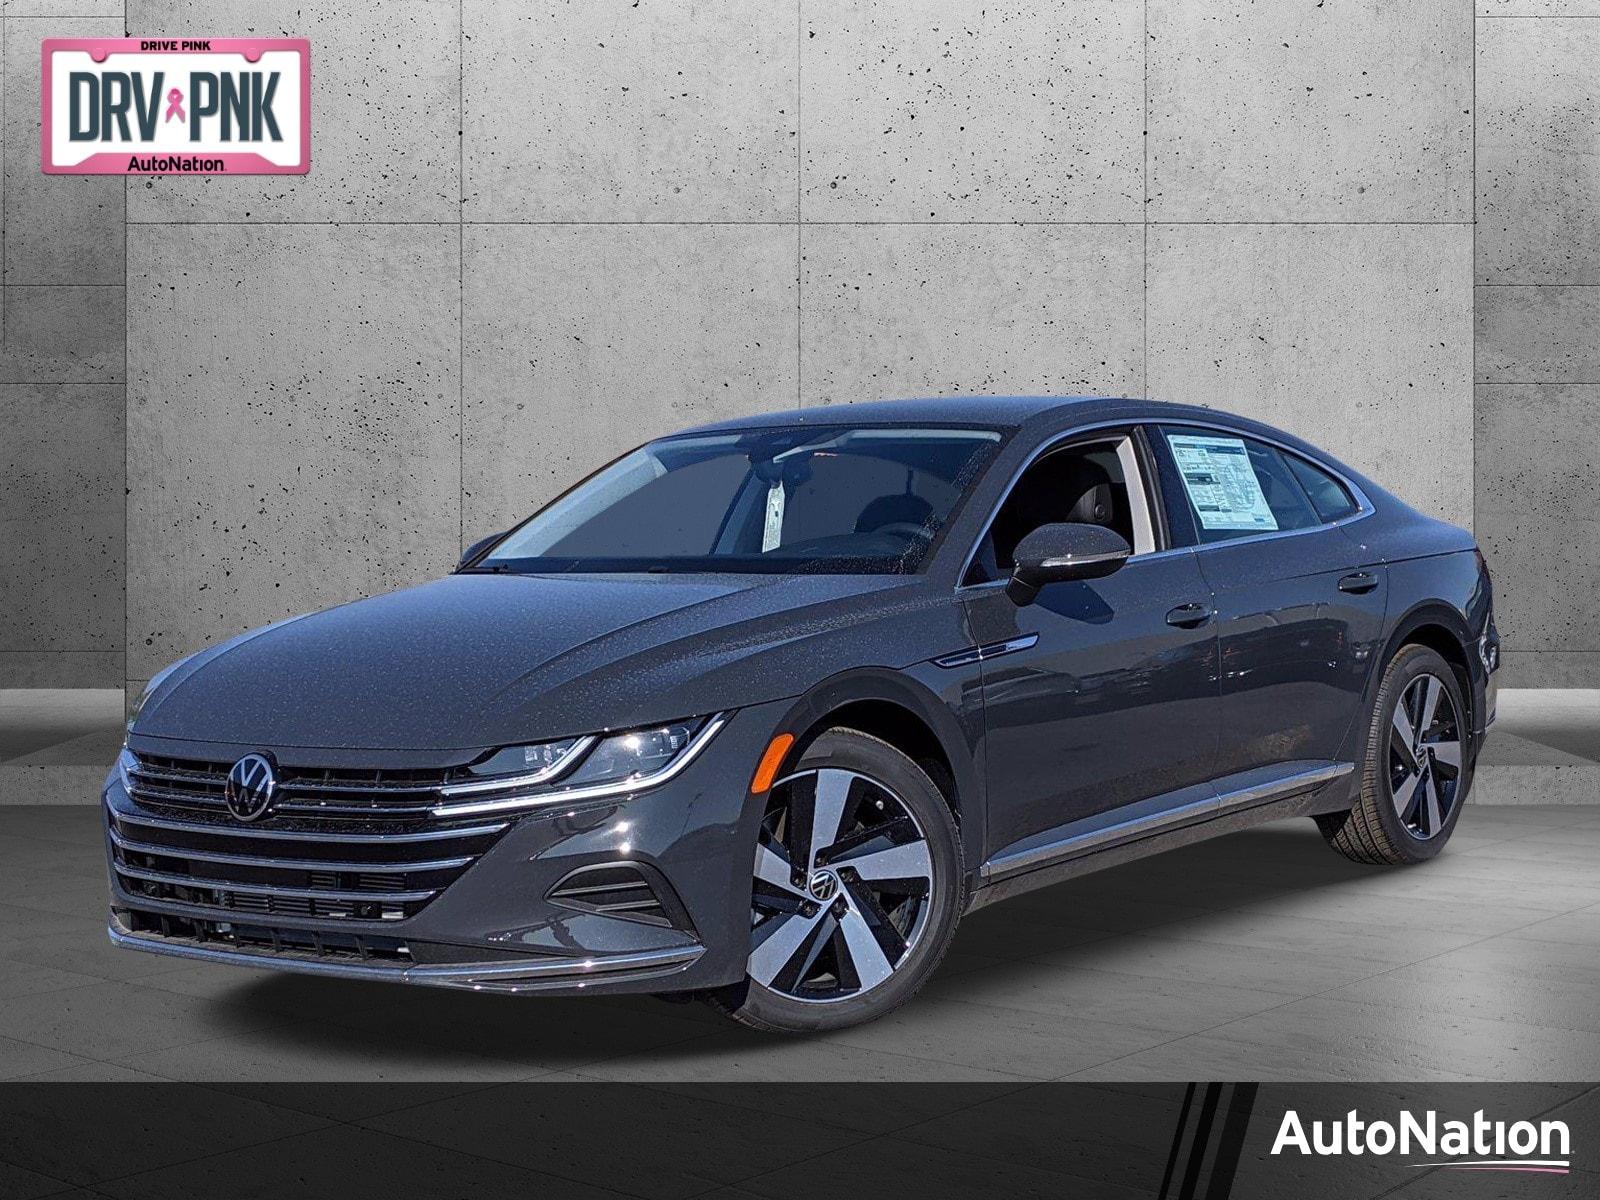 2021 Volkswagen Arteon 2.0T SE Sedan